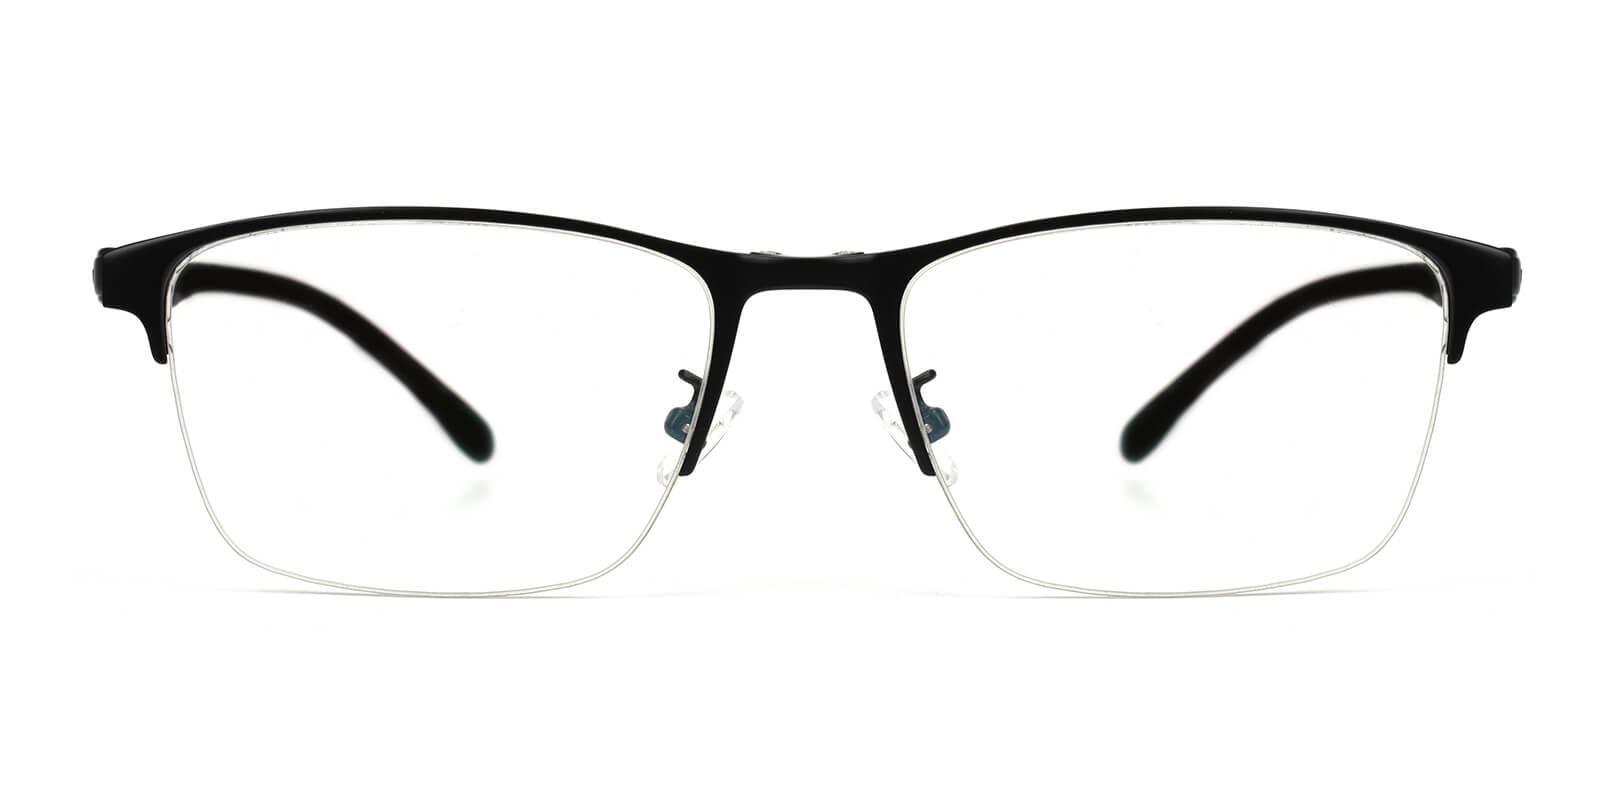 Erisy-Black-Rectangle-Metal-Eyeglasses-detail